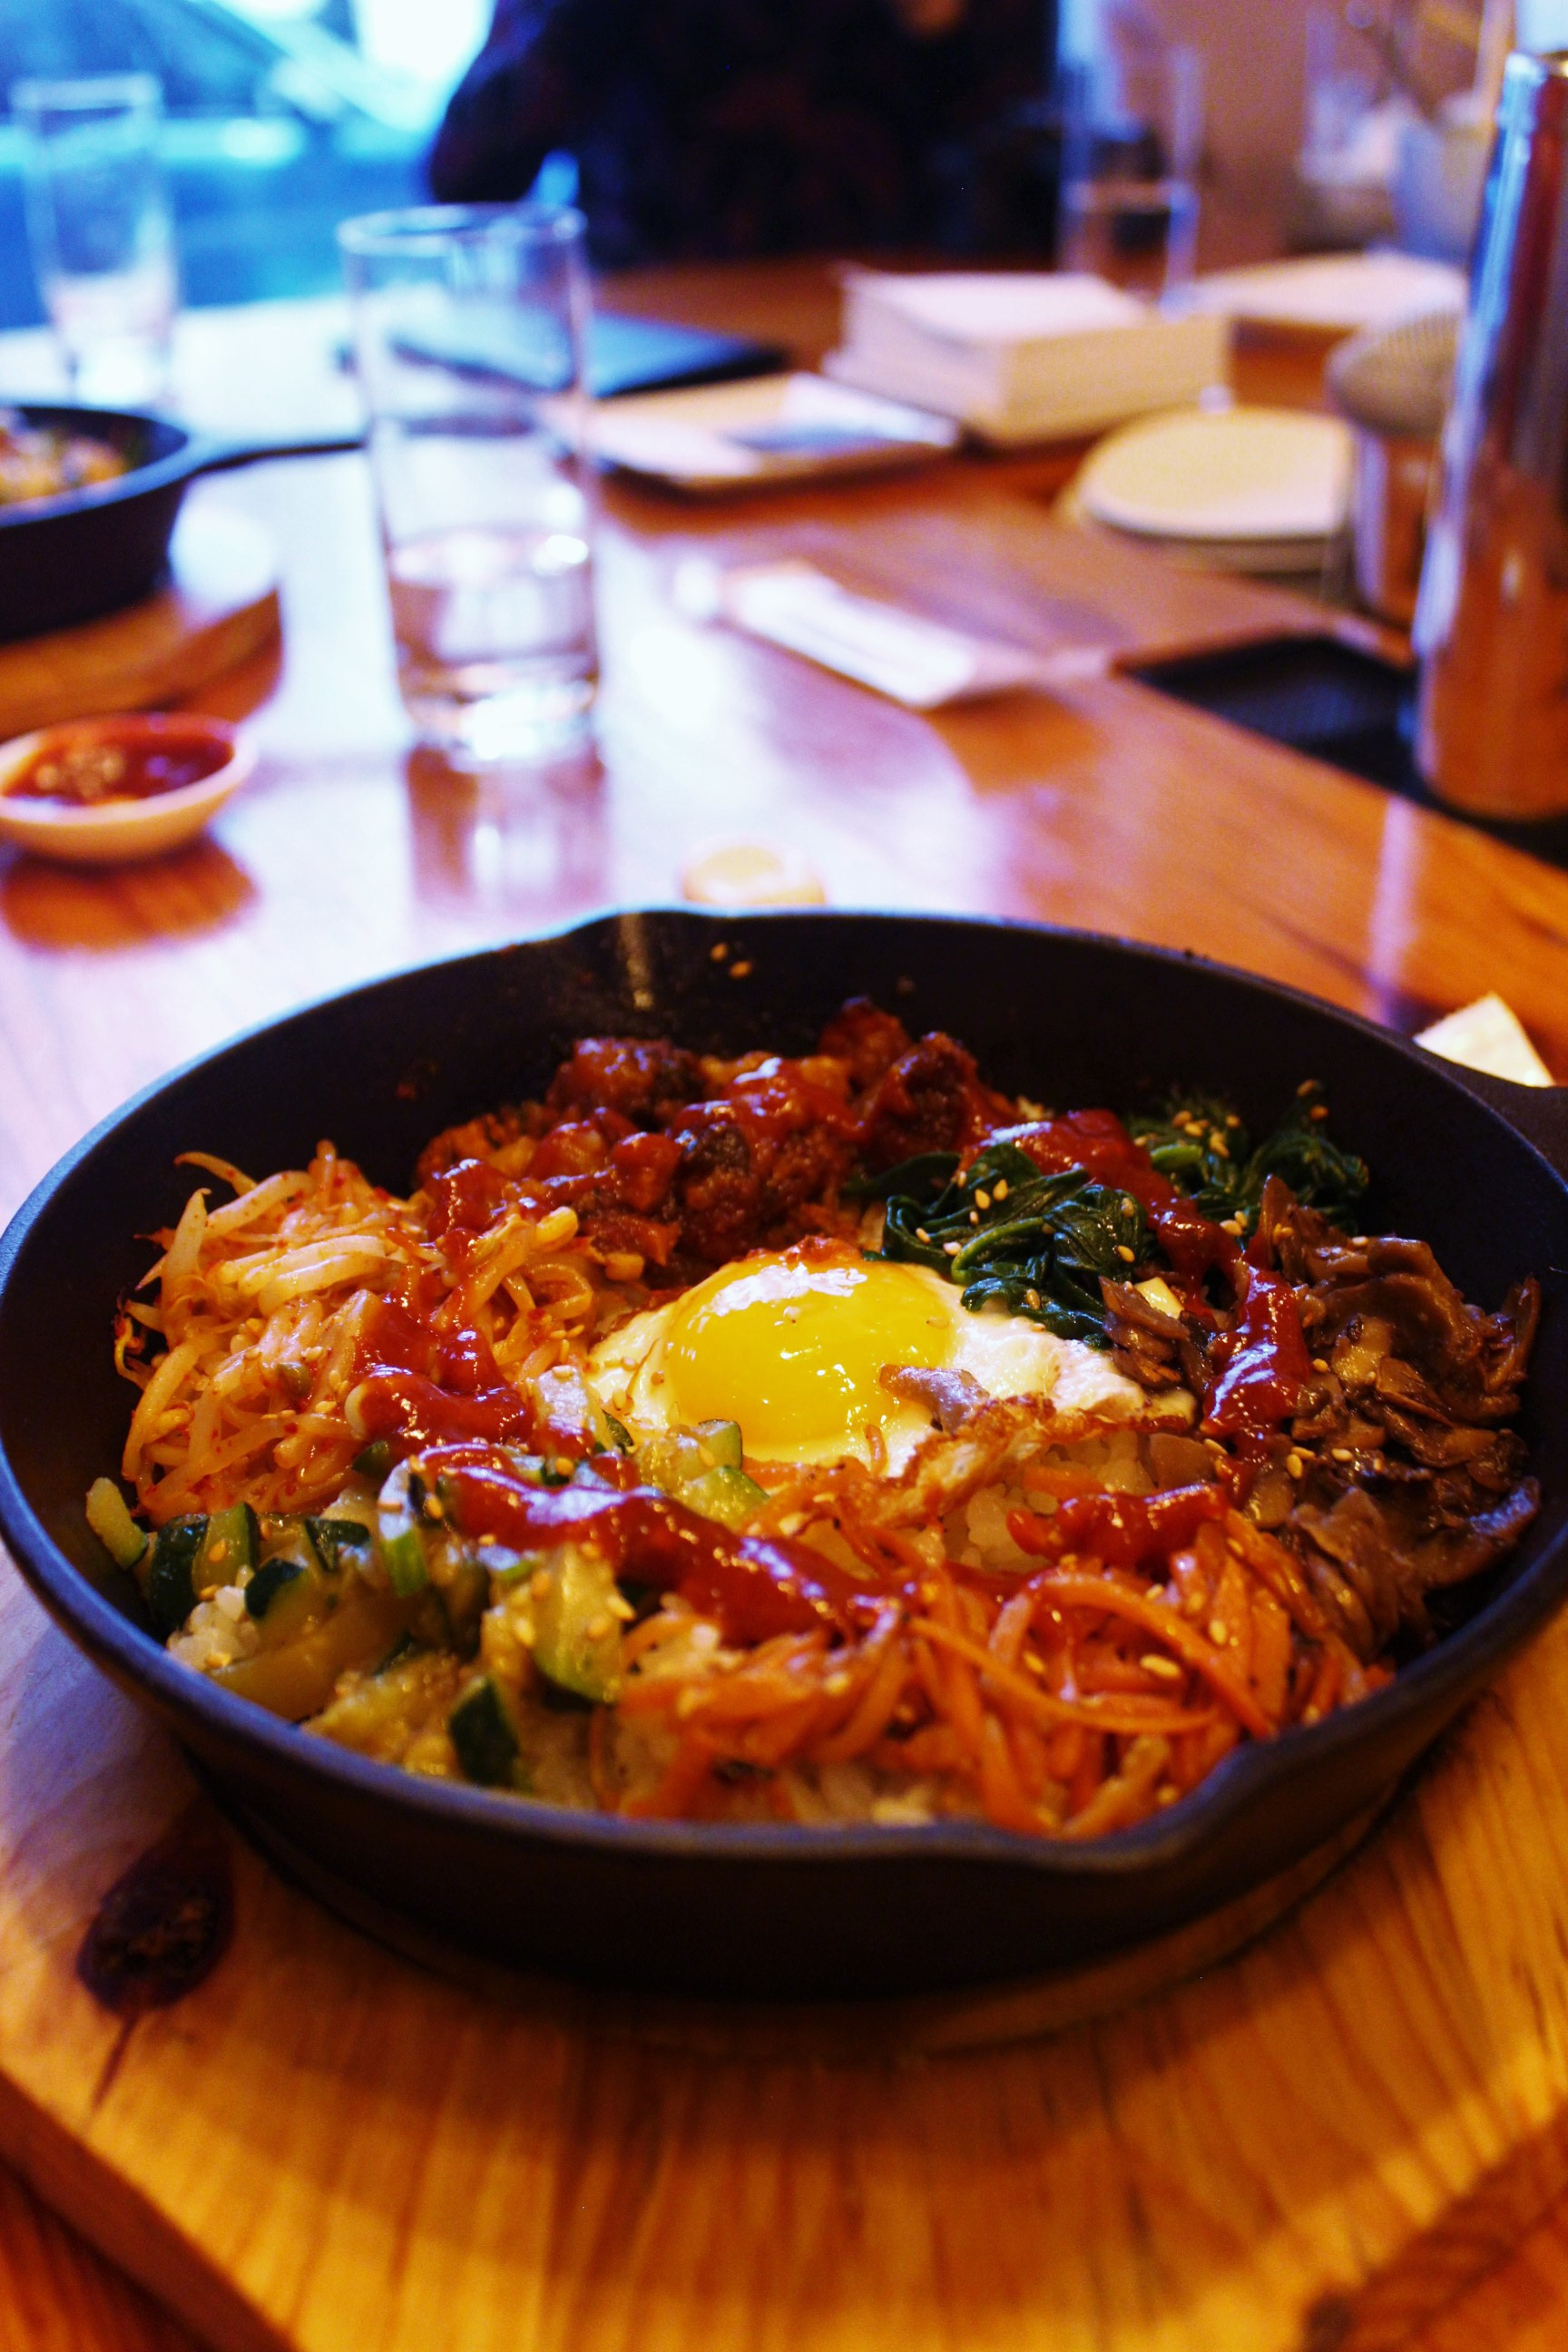 Spicy Pork Bibimbap in Sizzling Hot Plate at Danji